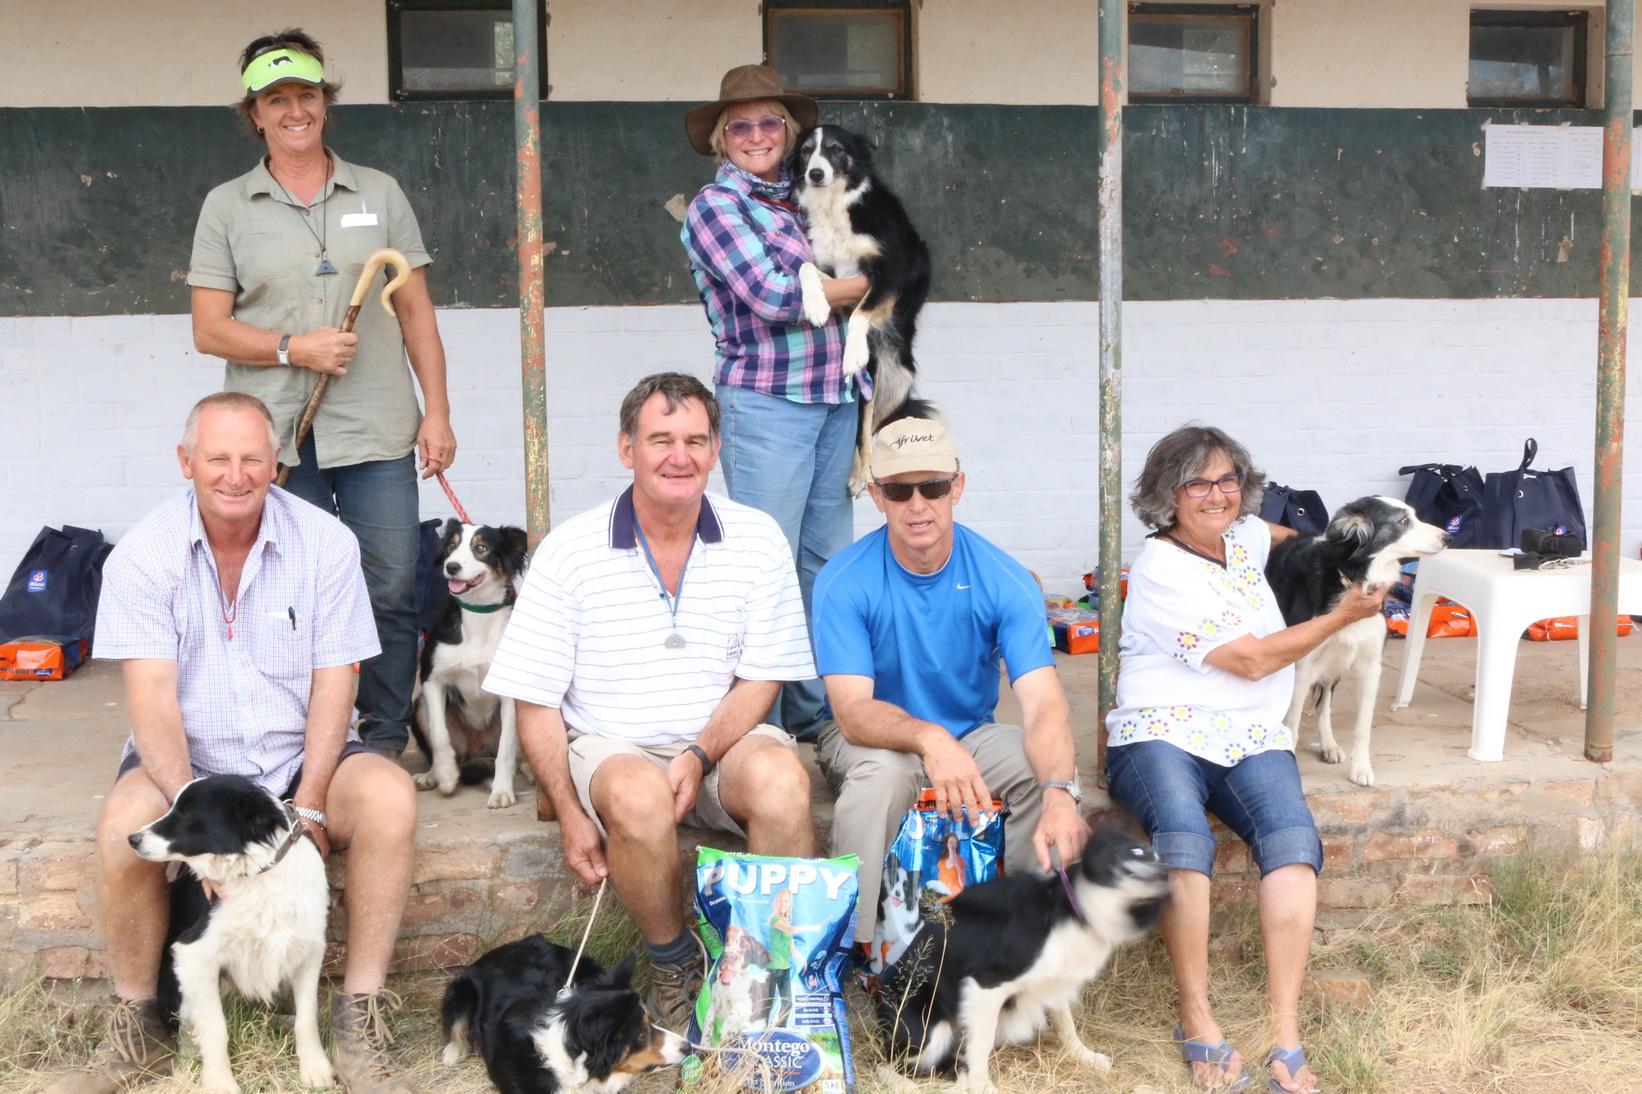 2015 Rooidraai winners